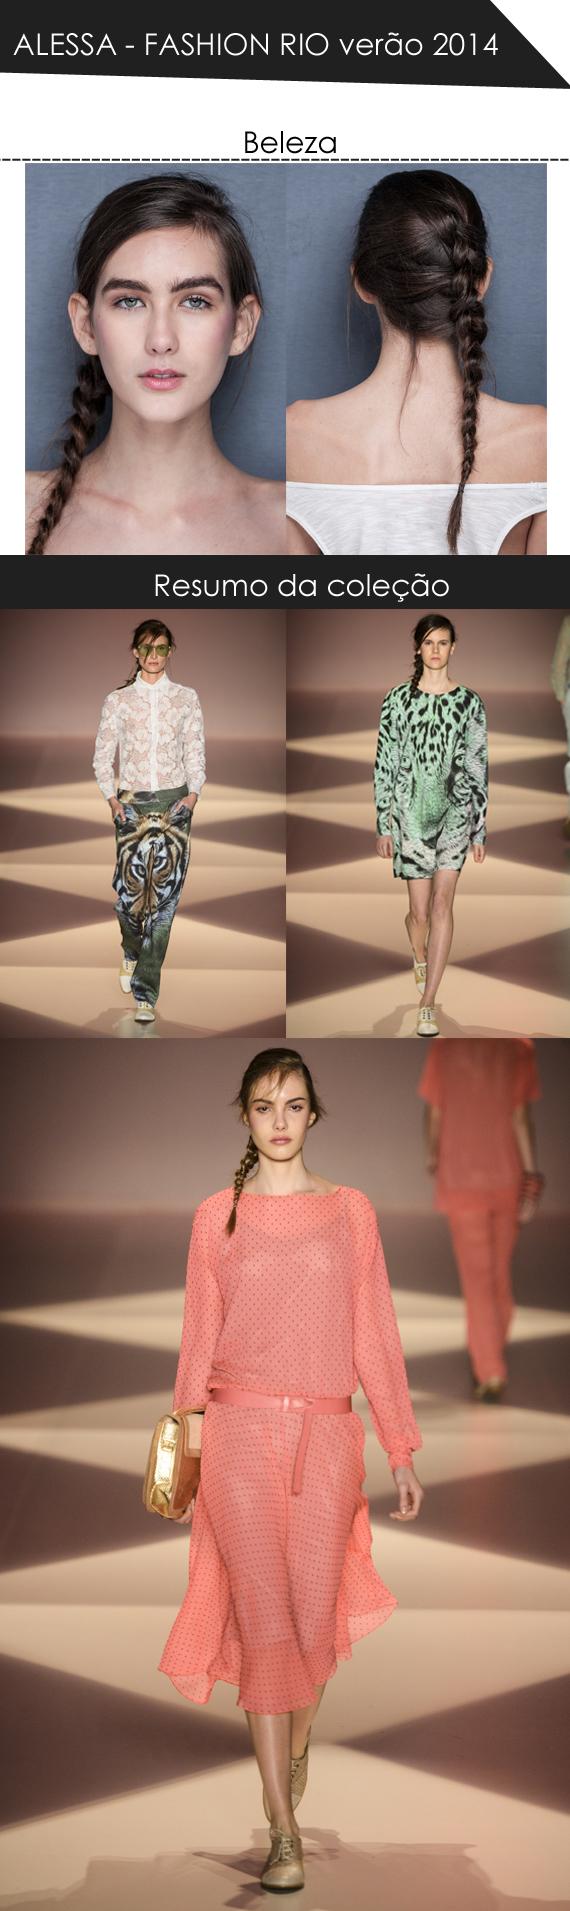 Alessa fashion rio verão 2014 por Mean Fashion